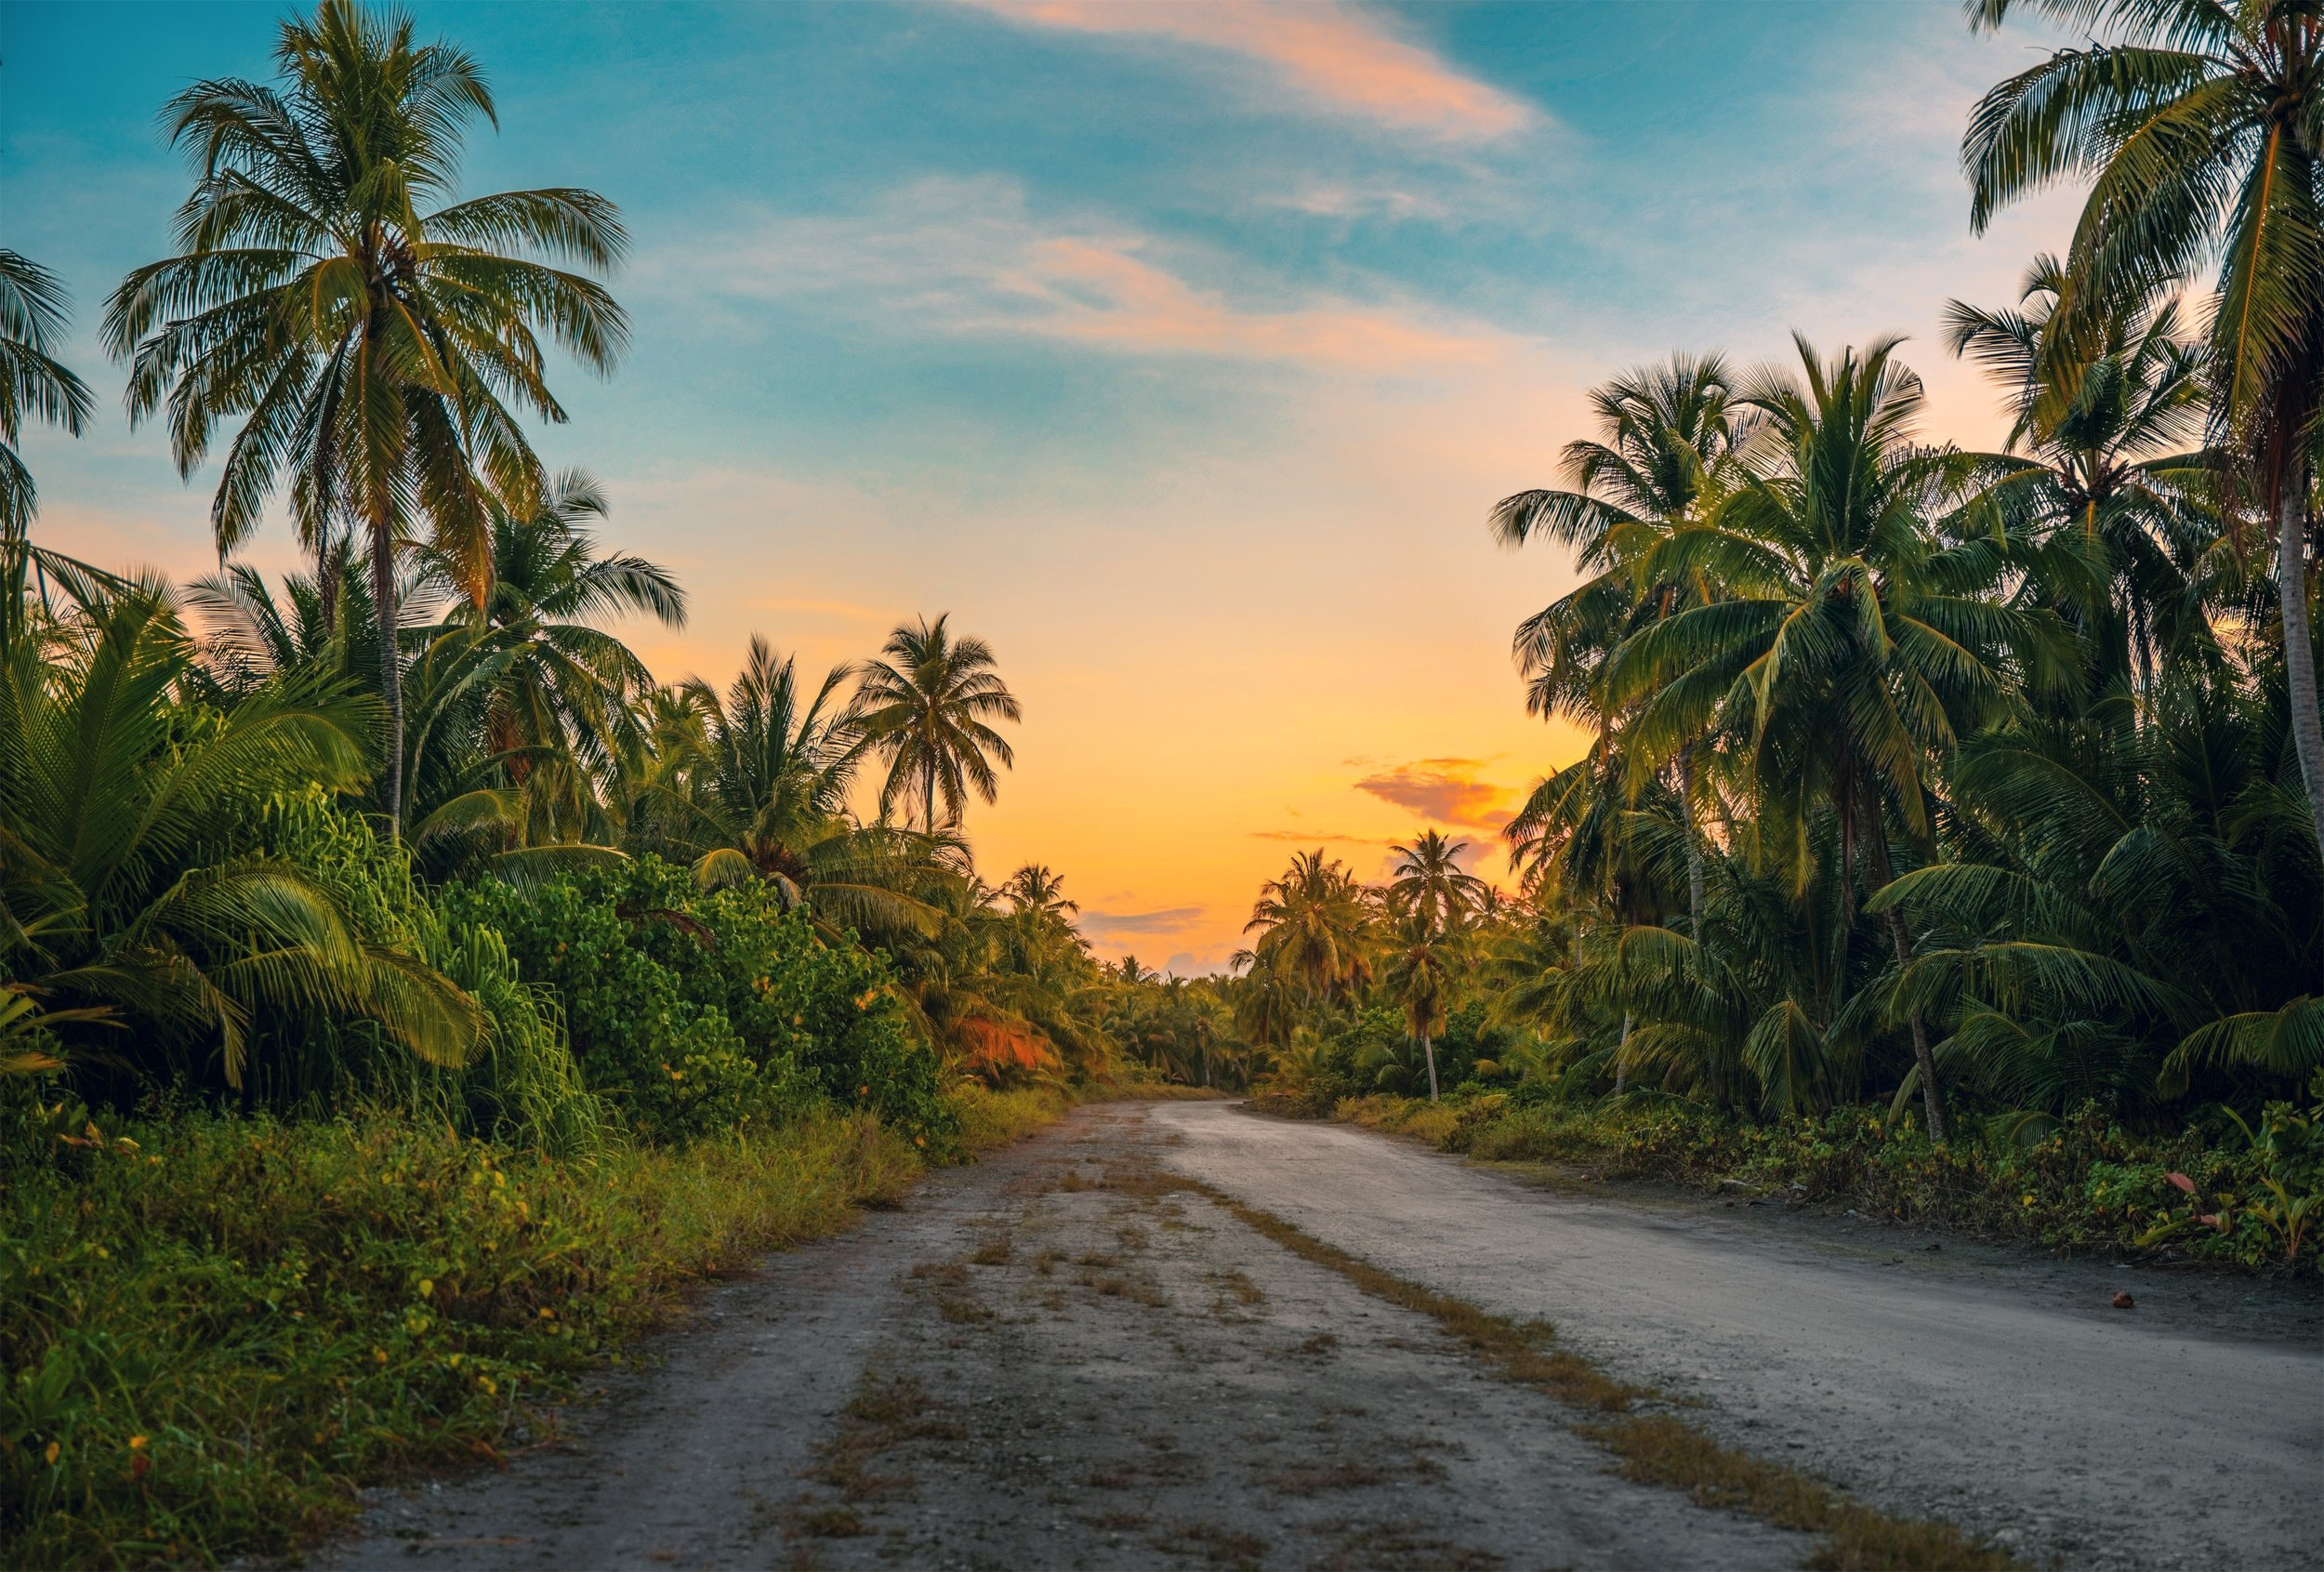 coconut-trees-dawn-daylight-1033729.jpg